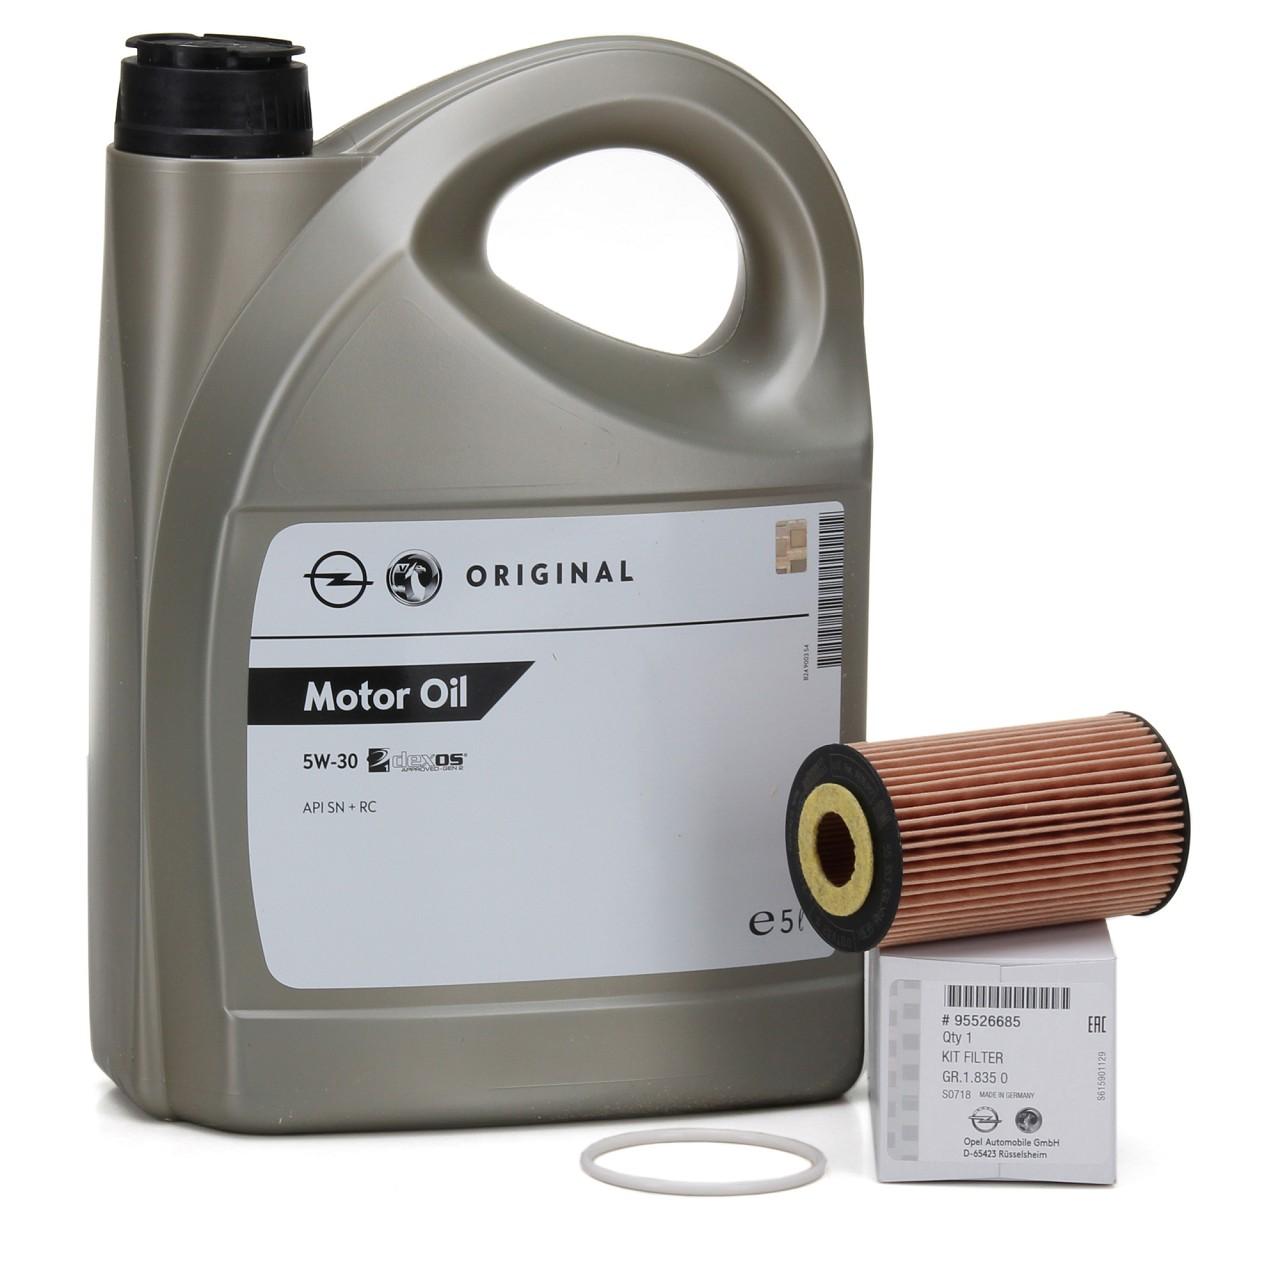 ORIGINAL Opel Motoröl 5W30 DEXOS1 Gen2 LONGLIFE 5L 95527874 + Ölfilter 95526685